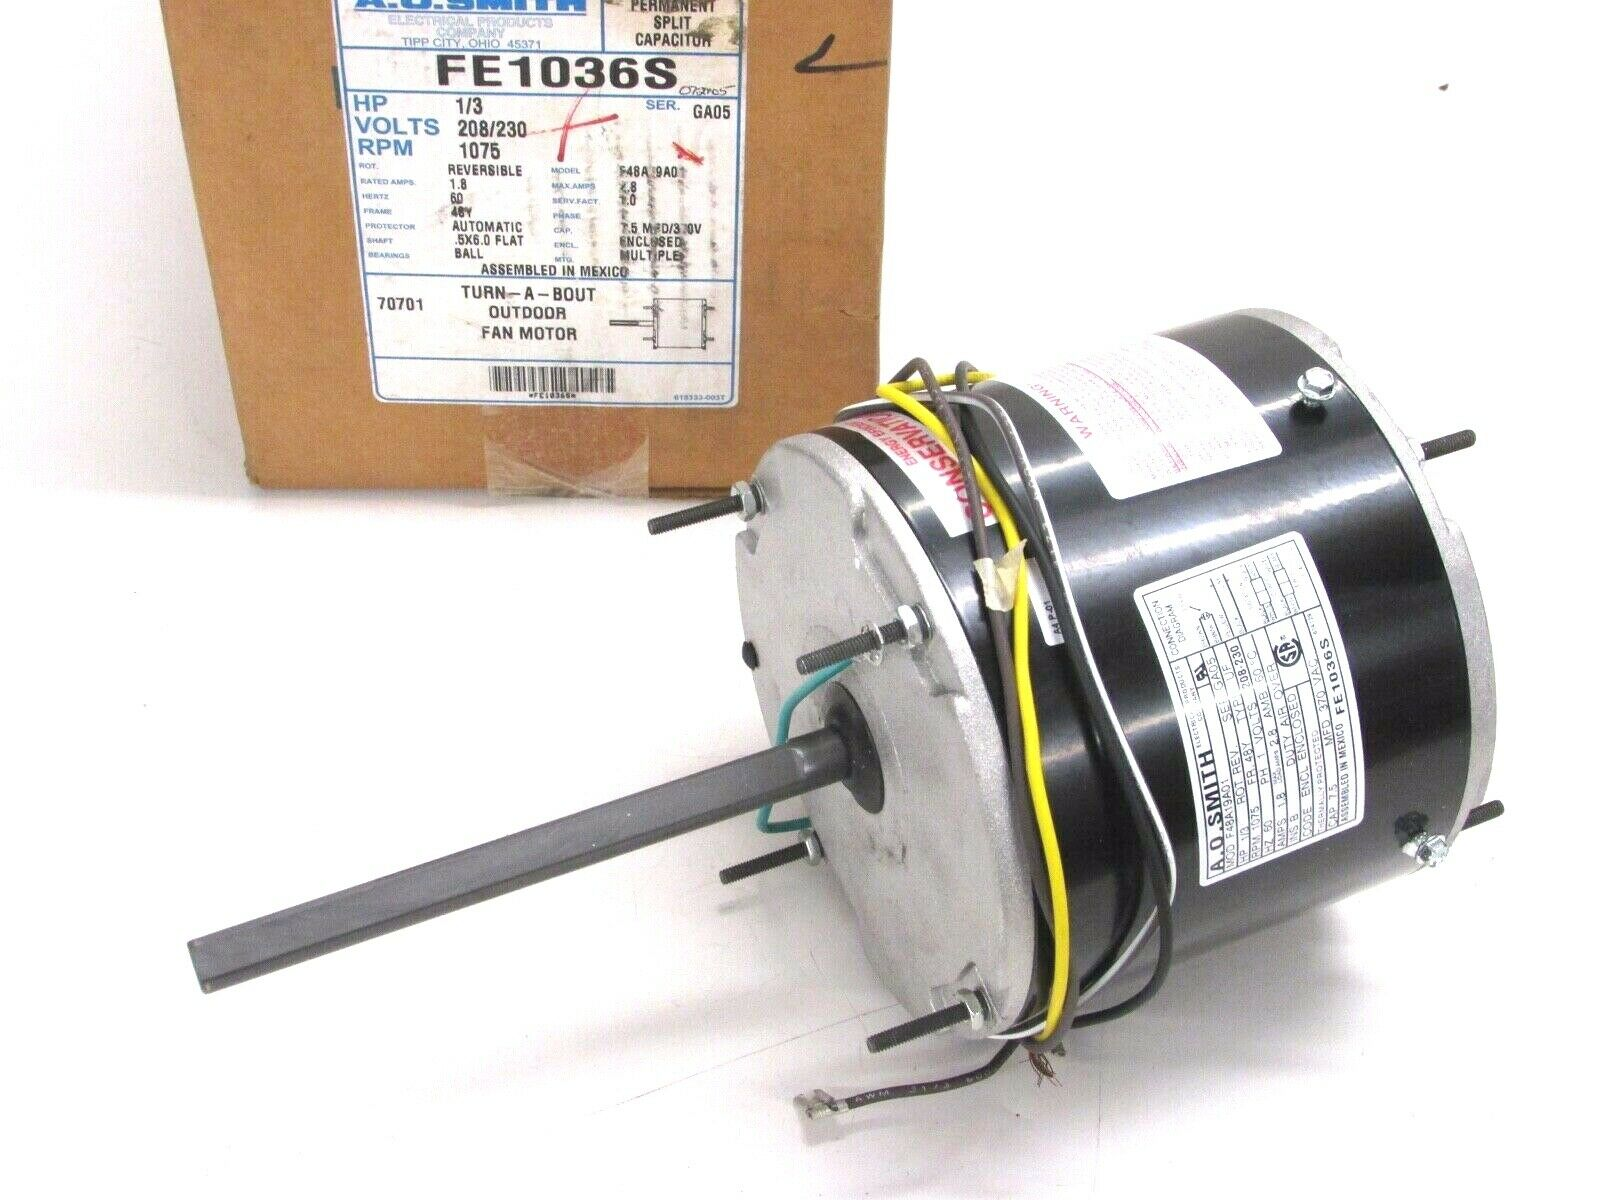 hight resolution of marathon electric 48a11t570 s88 158 condenser fan motor 1 3 hp 1075 rpm 208 230v for sale online ebay